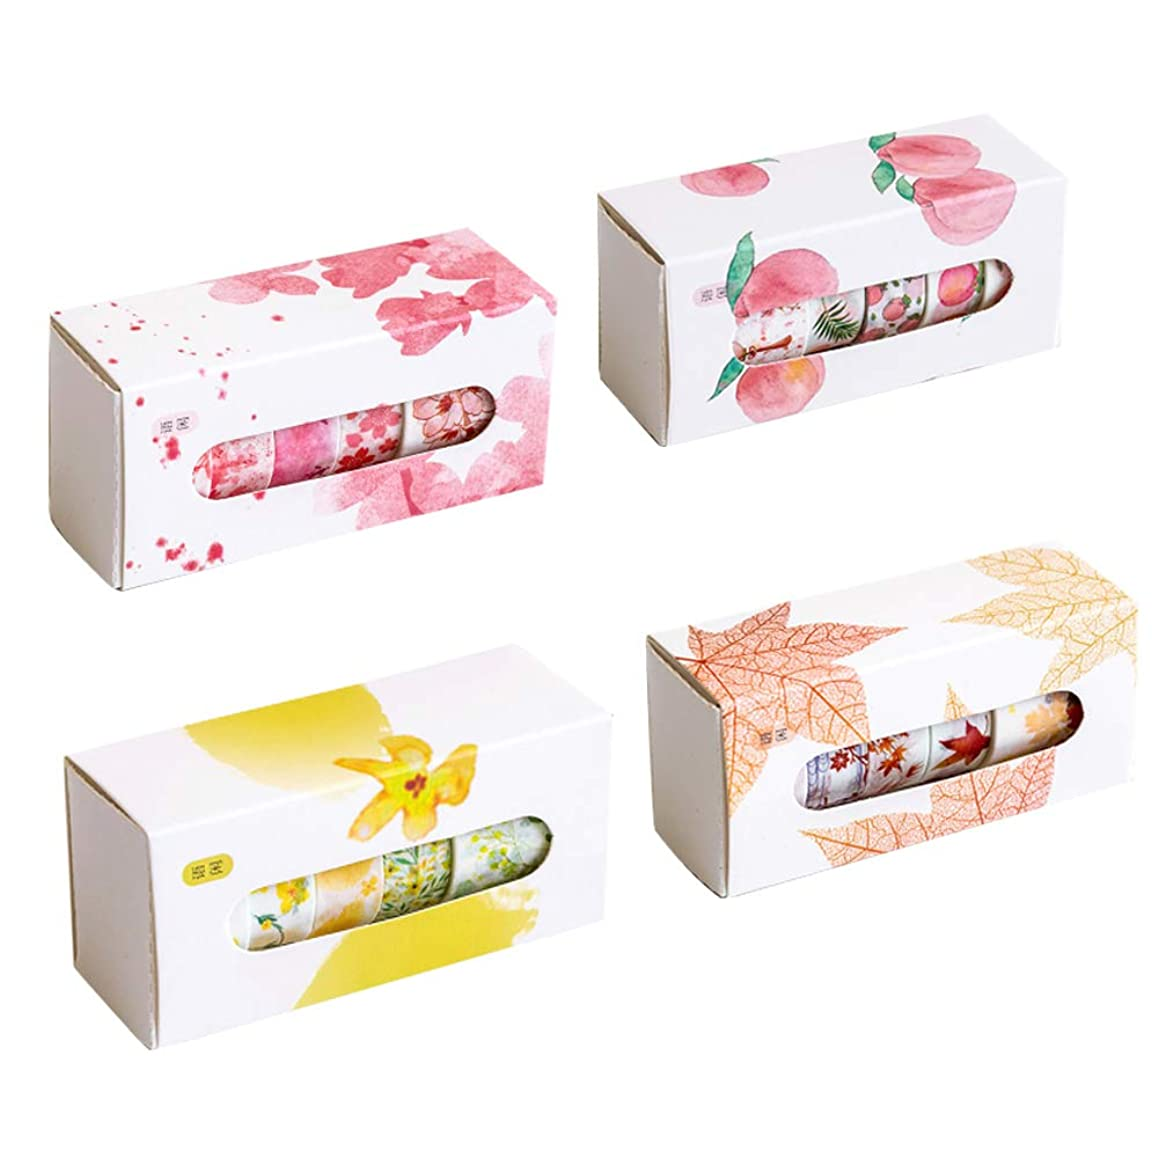 Kawaii Floral Washi Tape Set (4 Box, Assorted 20 Rolls) Lavender Plant Leaves Planet Marine Life Sailboat Fruit Masking Tape DIY Craft Scrapbboking Diary Album Decorative Label School Stationery (B)